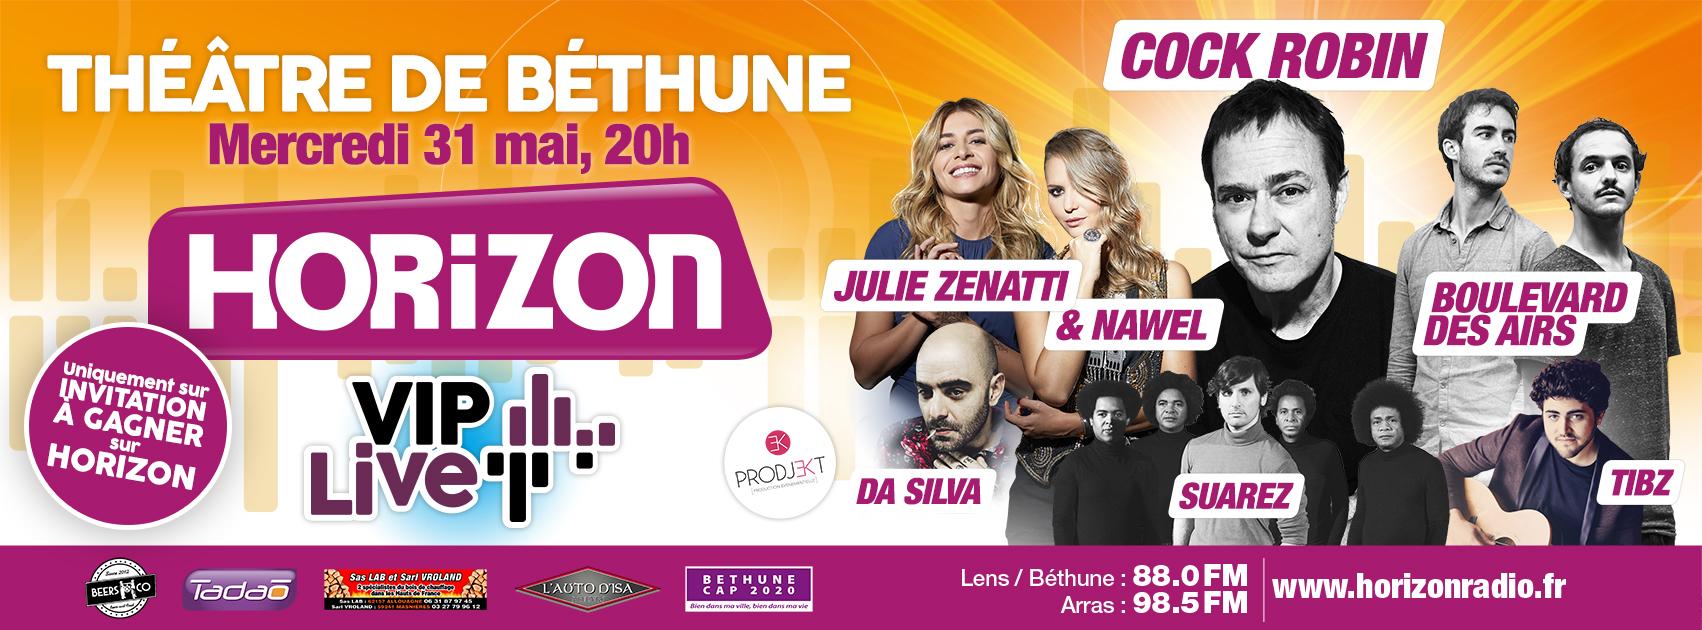 "Horizon prépare un ""Horizon VIP Live"""